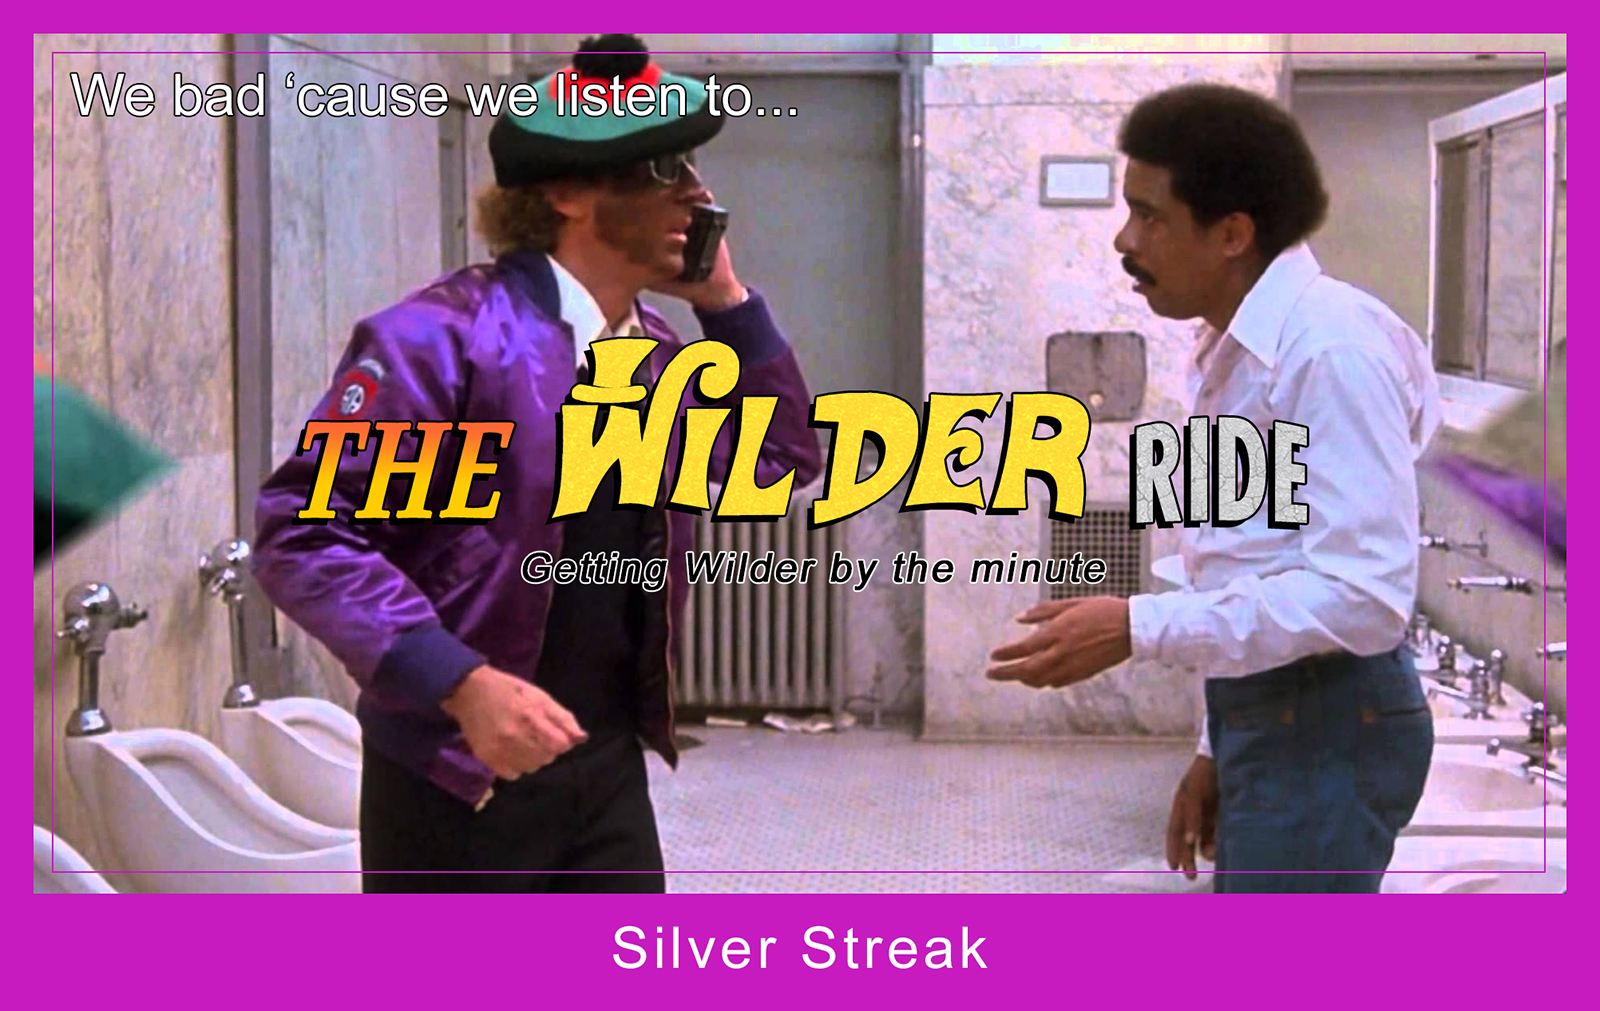 Gene Wilder - Silver Streak with Richard Pryor - Trading Card